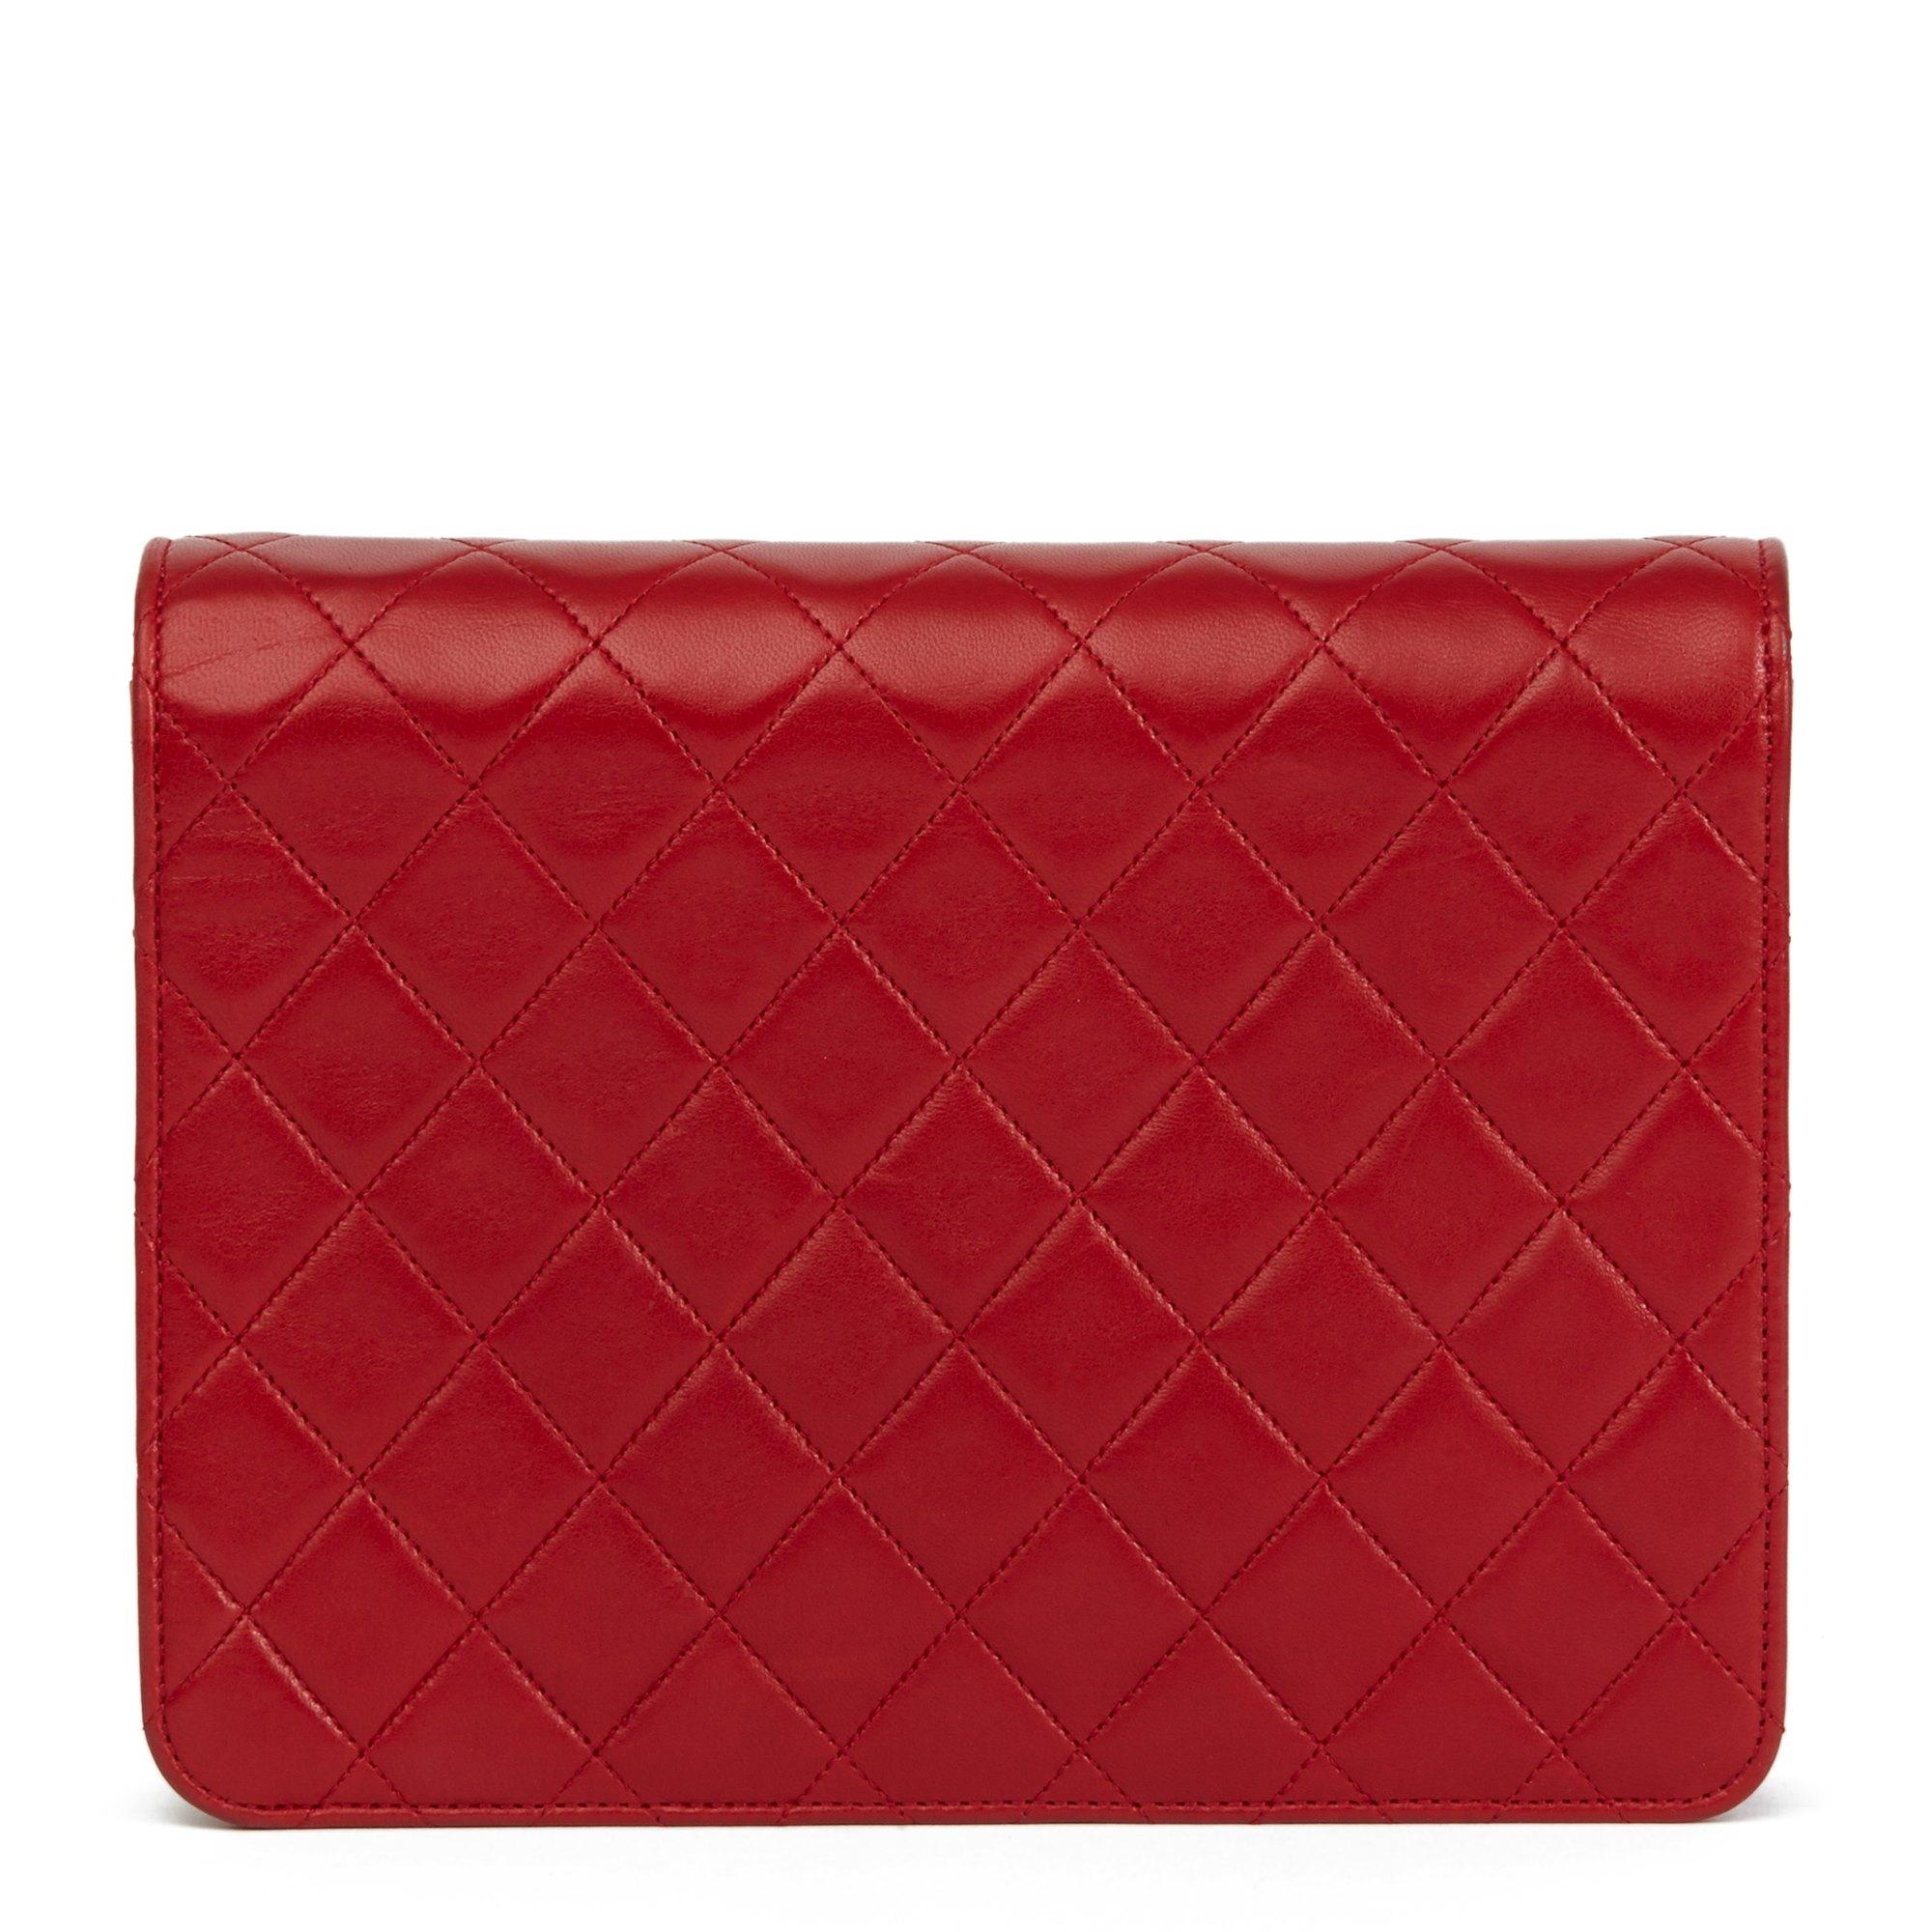 81e523eb73c5 Chanel Small Classic Single Flap Bag 1990's HB2786 | Second Hand ...